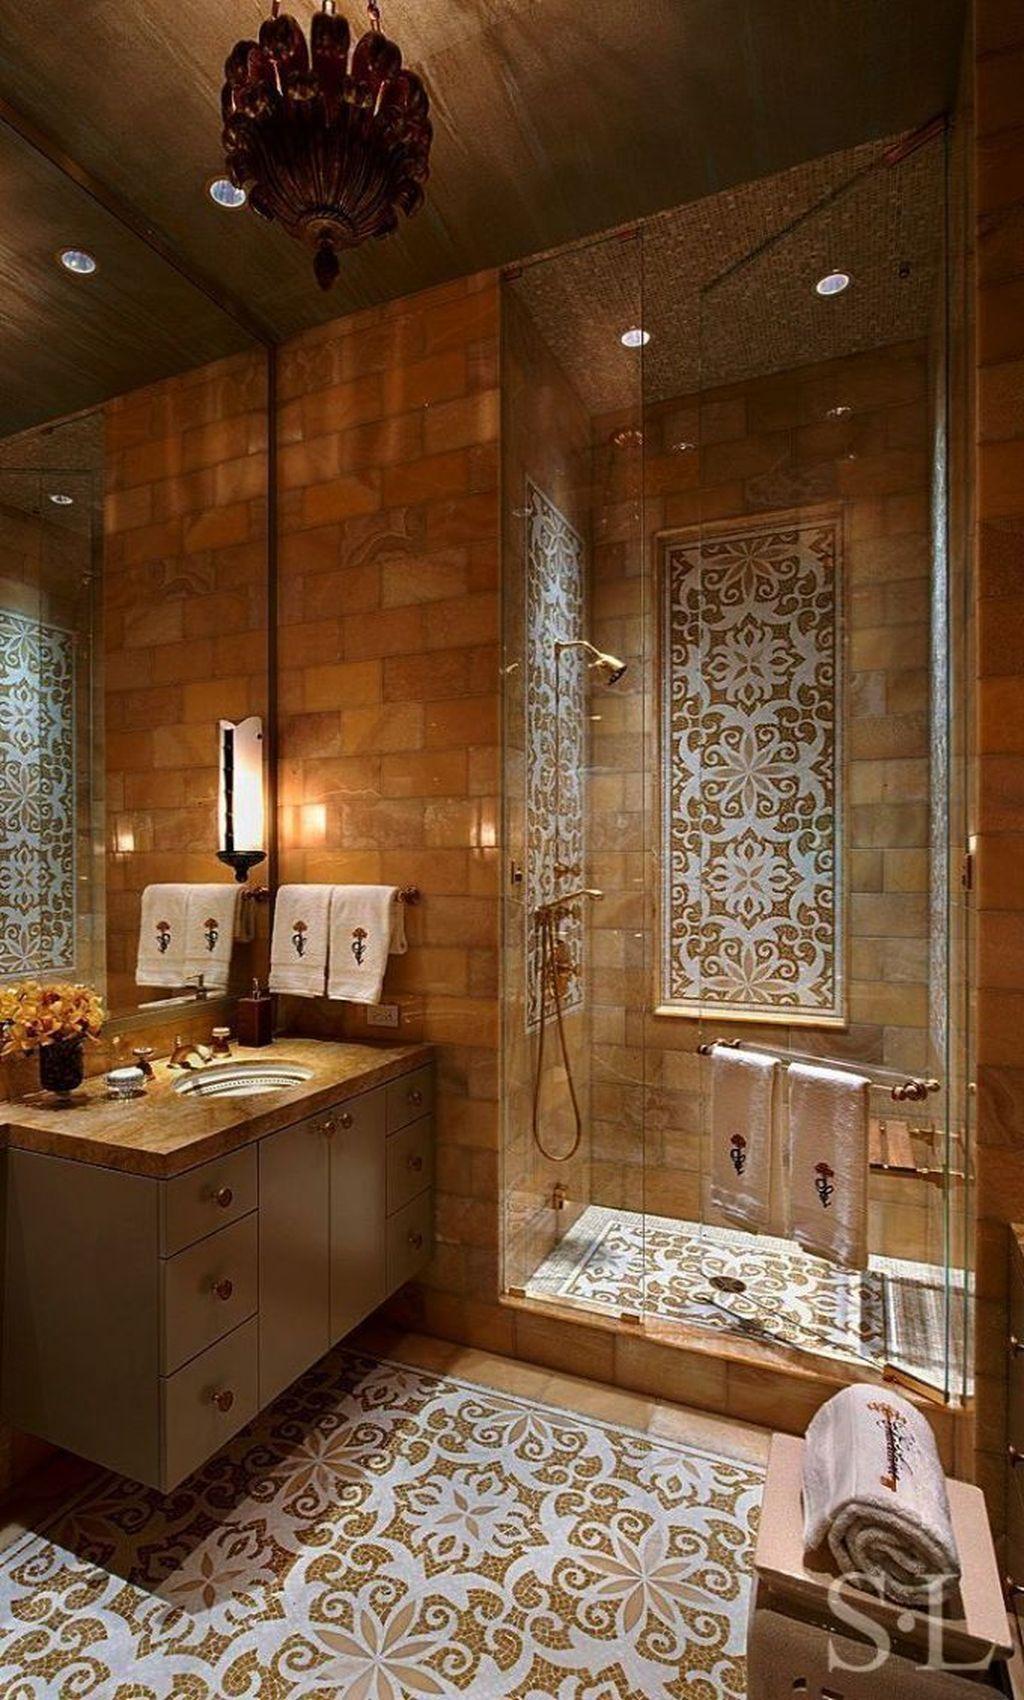 33 Nice Bathroom Cabinets Ideas Bathroom Interior Design Sophisticated Bathroom Bathroom Interior